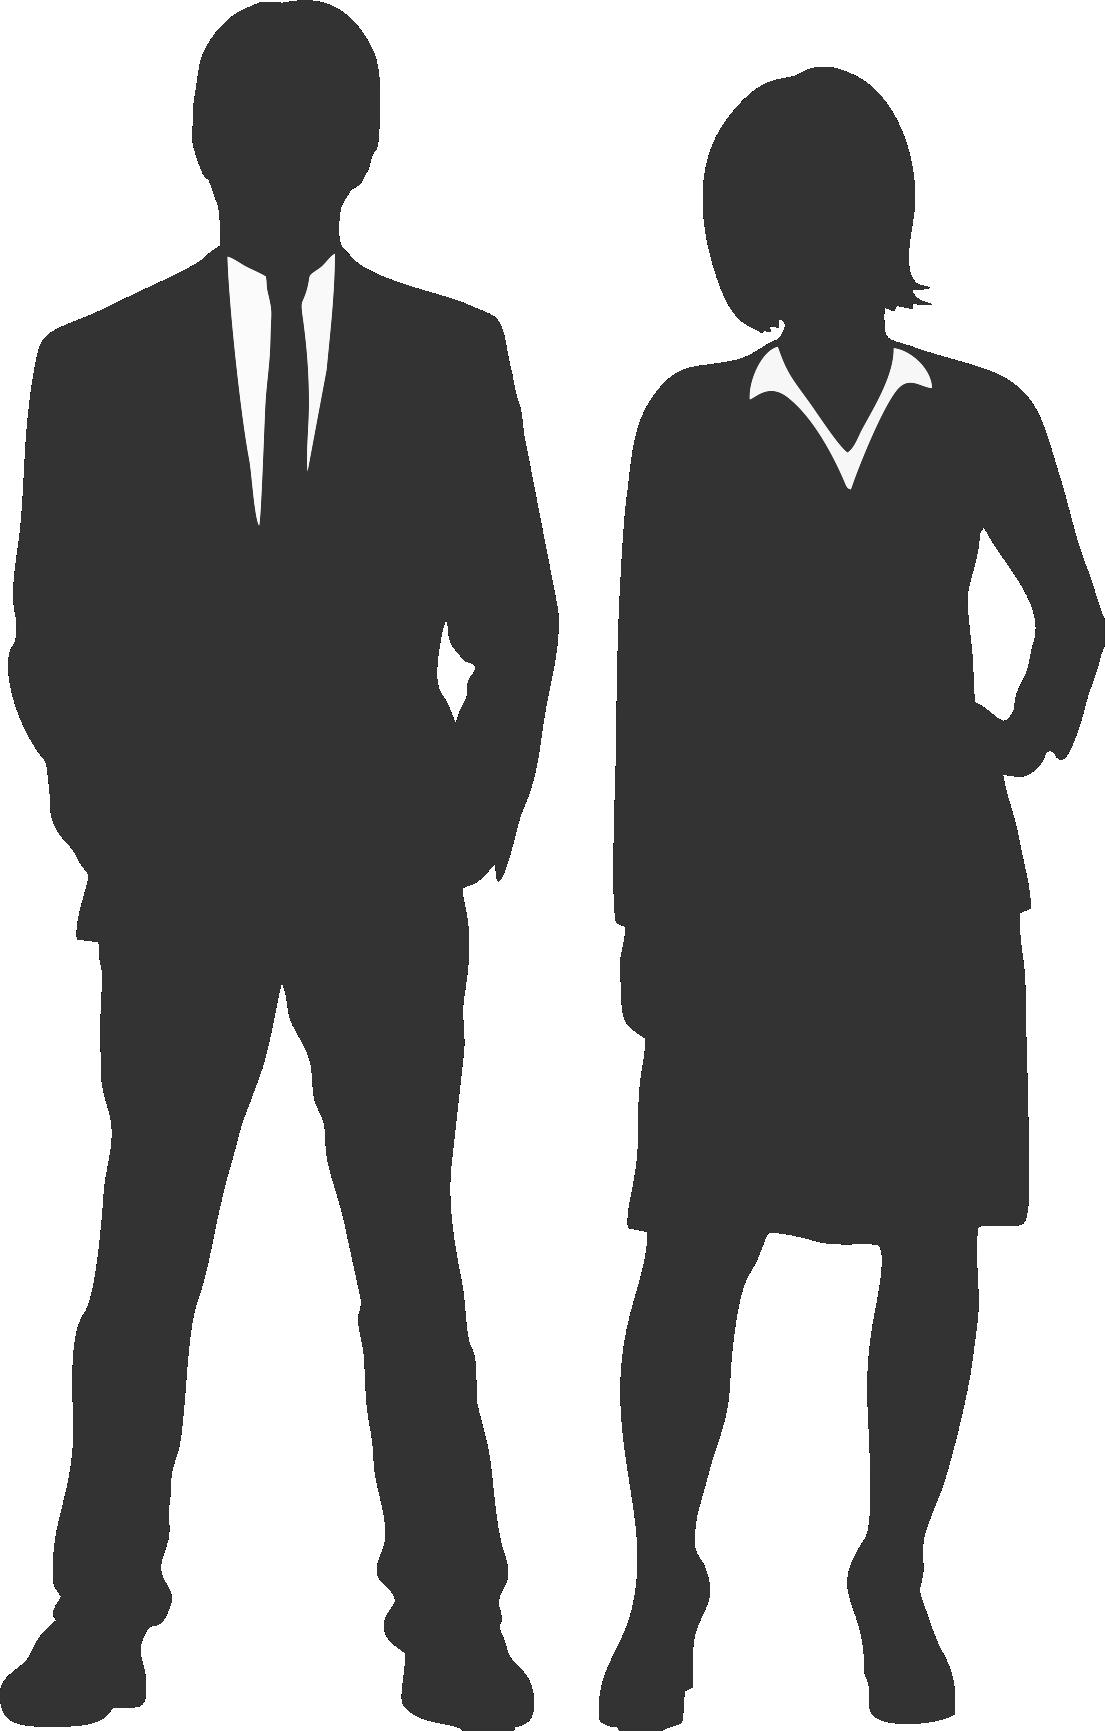 Minenii executive assessments employee. Suit clipart recruitment